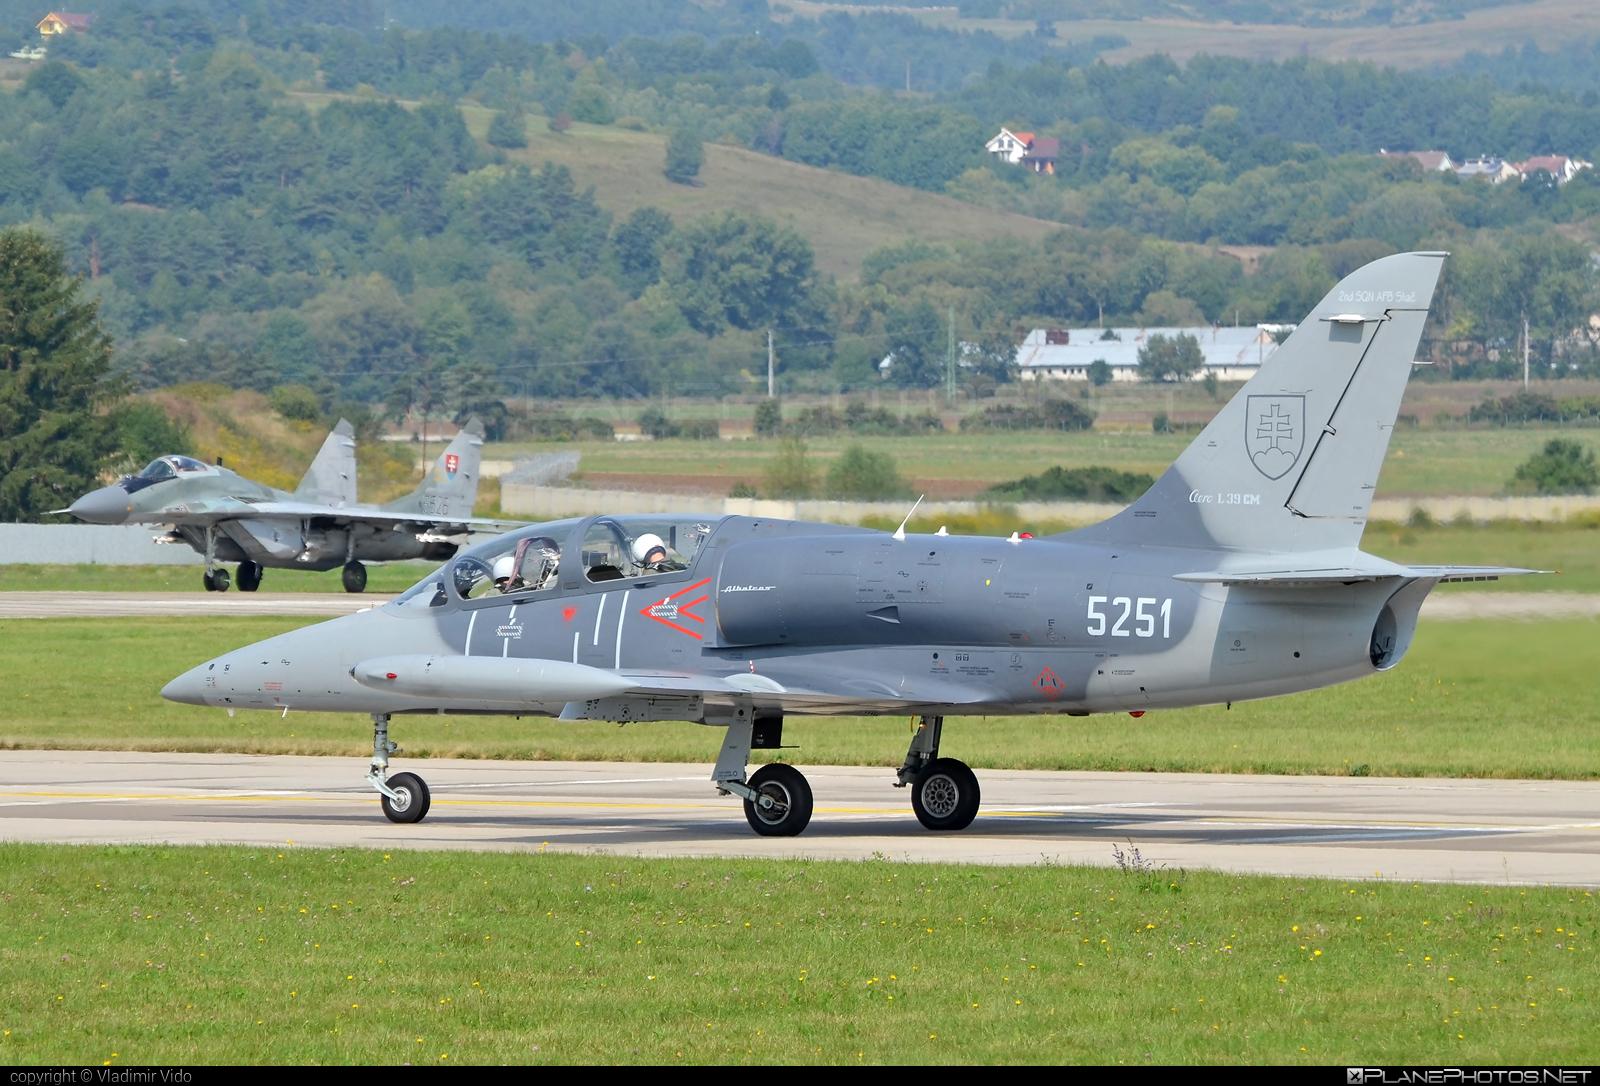 Aero L-39CM Albatros - 5251 operated by Vzdušné sily OS SR (Slovak Air Force) #aero #aerol39 #aerol39albatros #aerol39cmalbatros #albatros #l39 #l39cm #l39cmalbatros #slovakairforce #vzdusnesilyossr